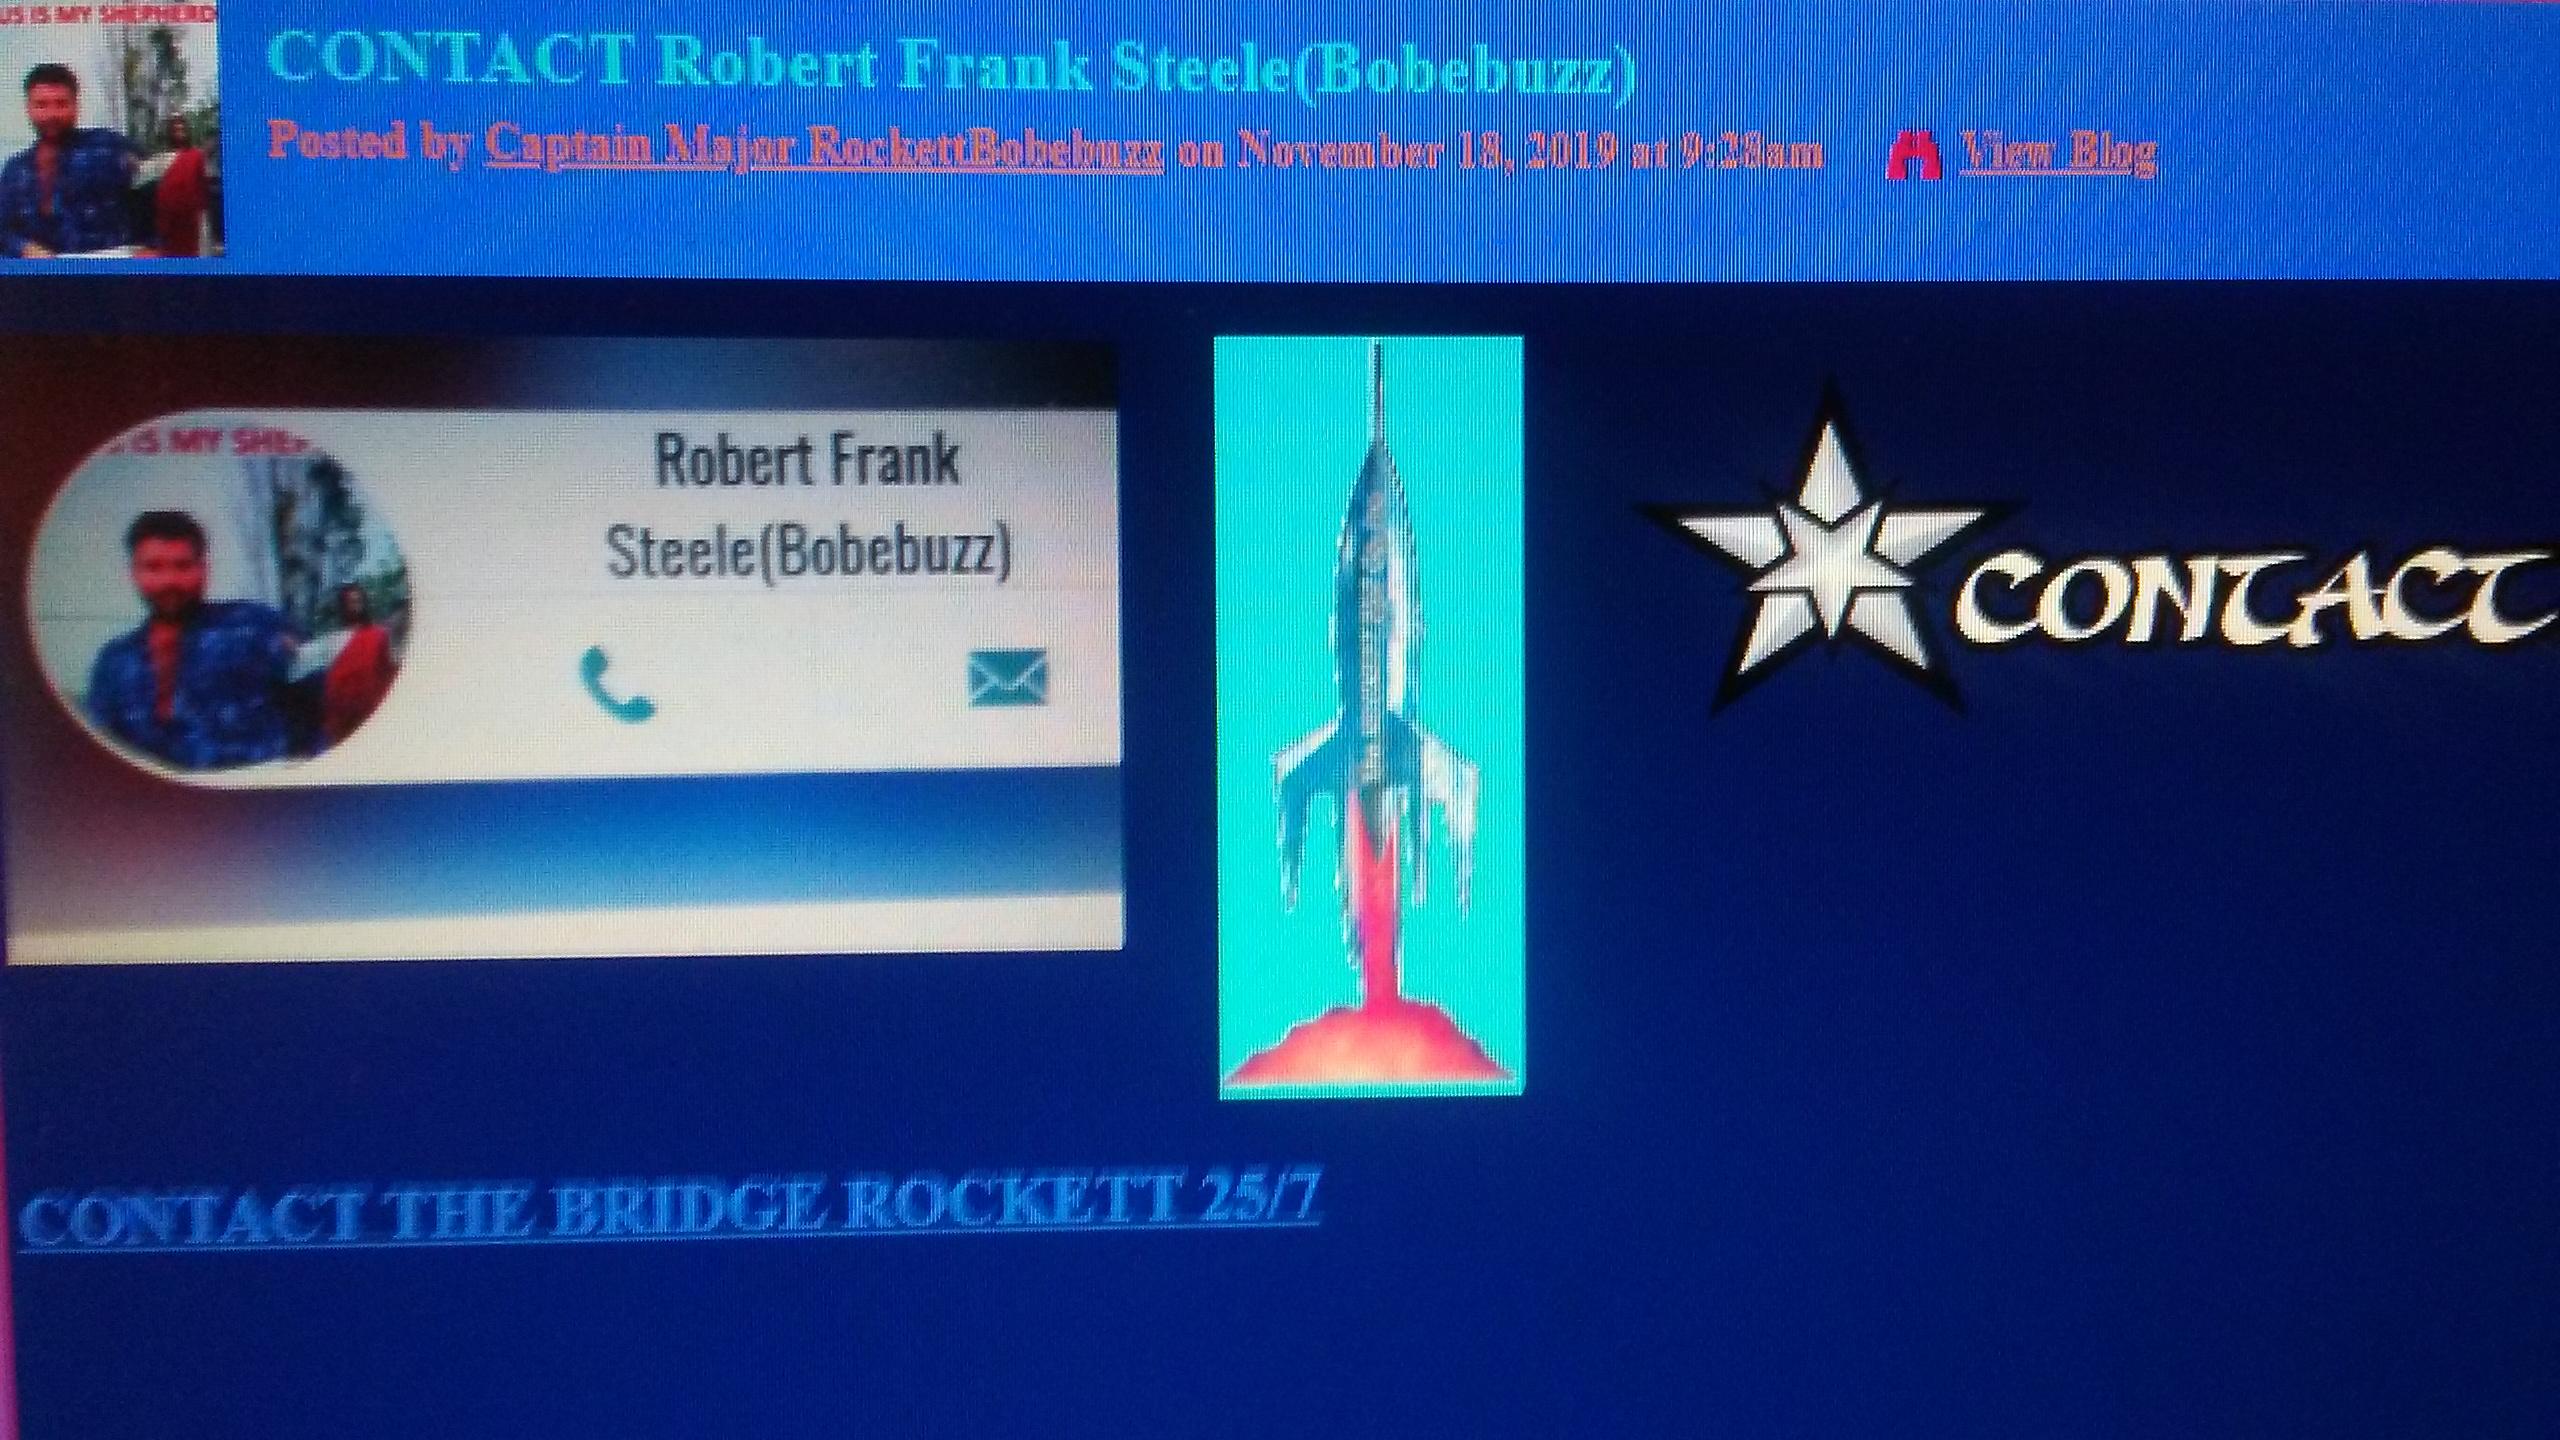 ROCKETT 25/7 CONTACT Captain Major RockettBobebuzz